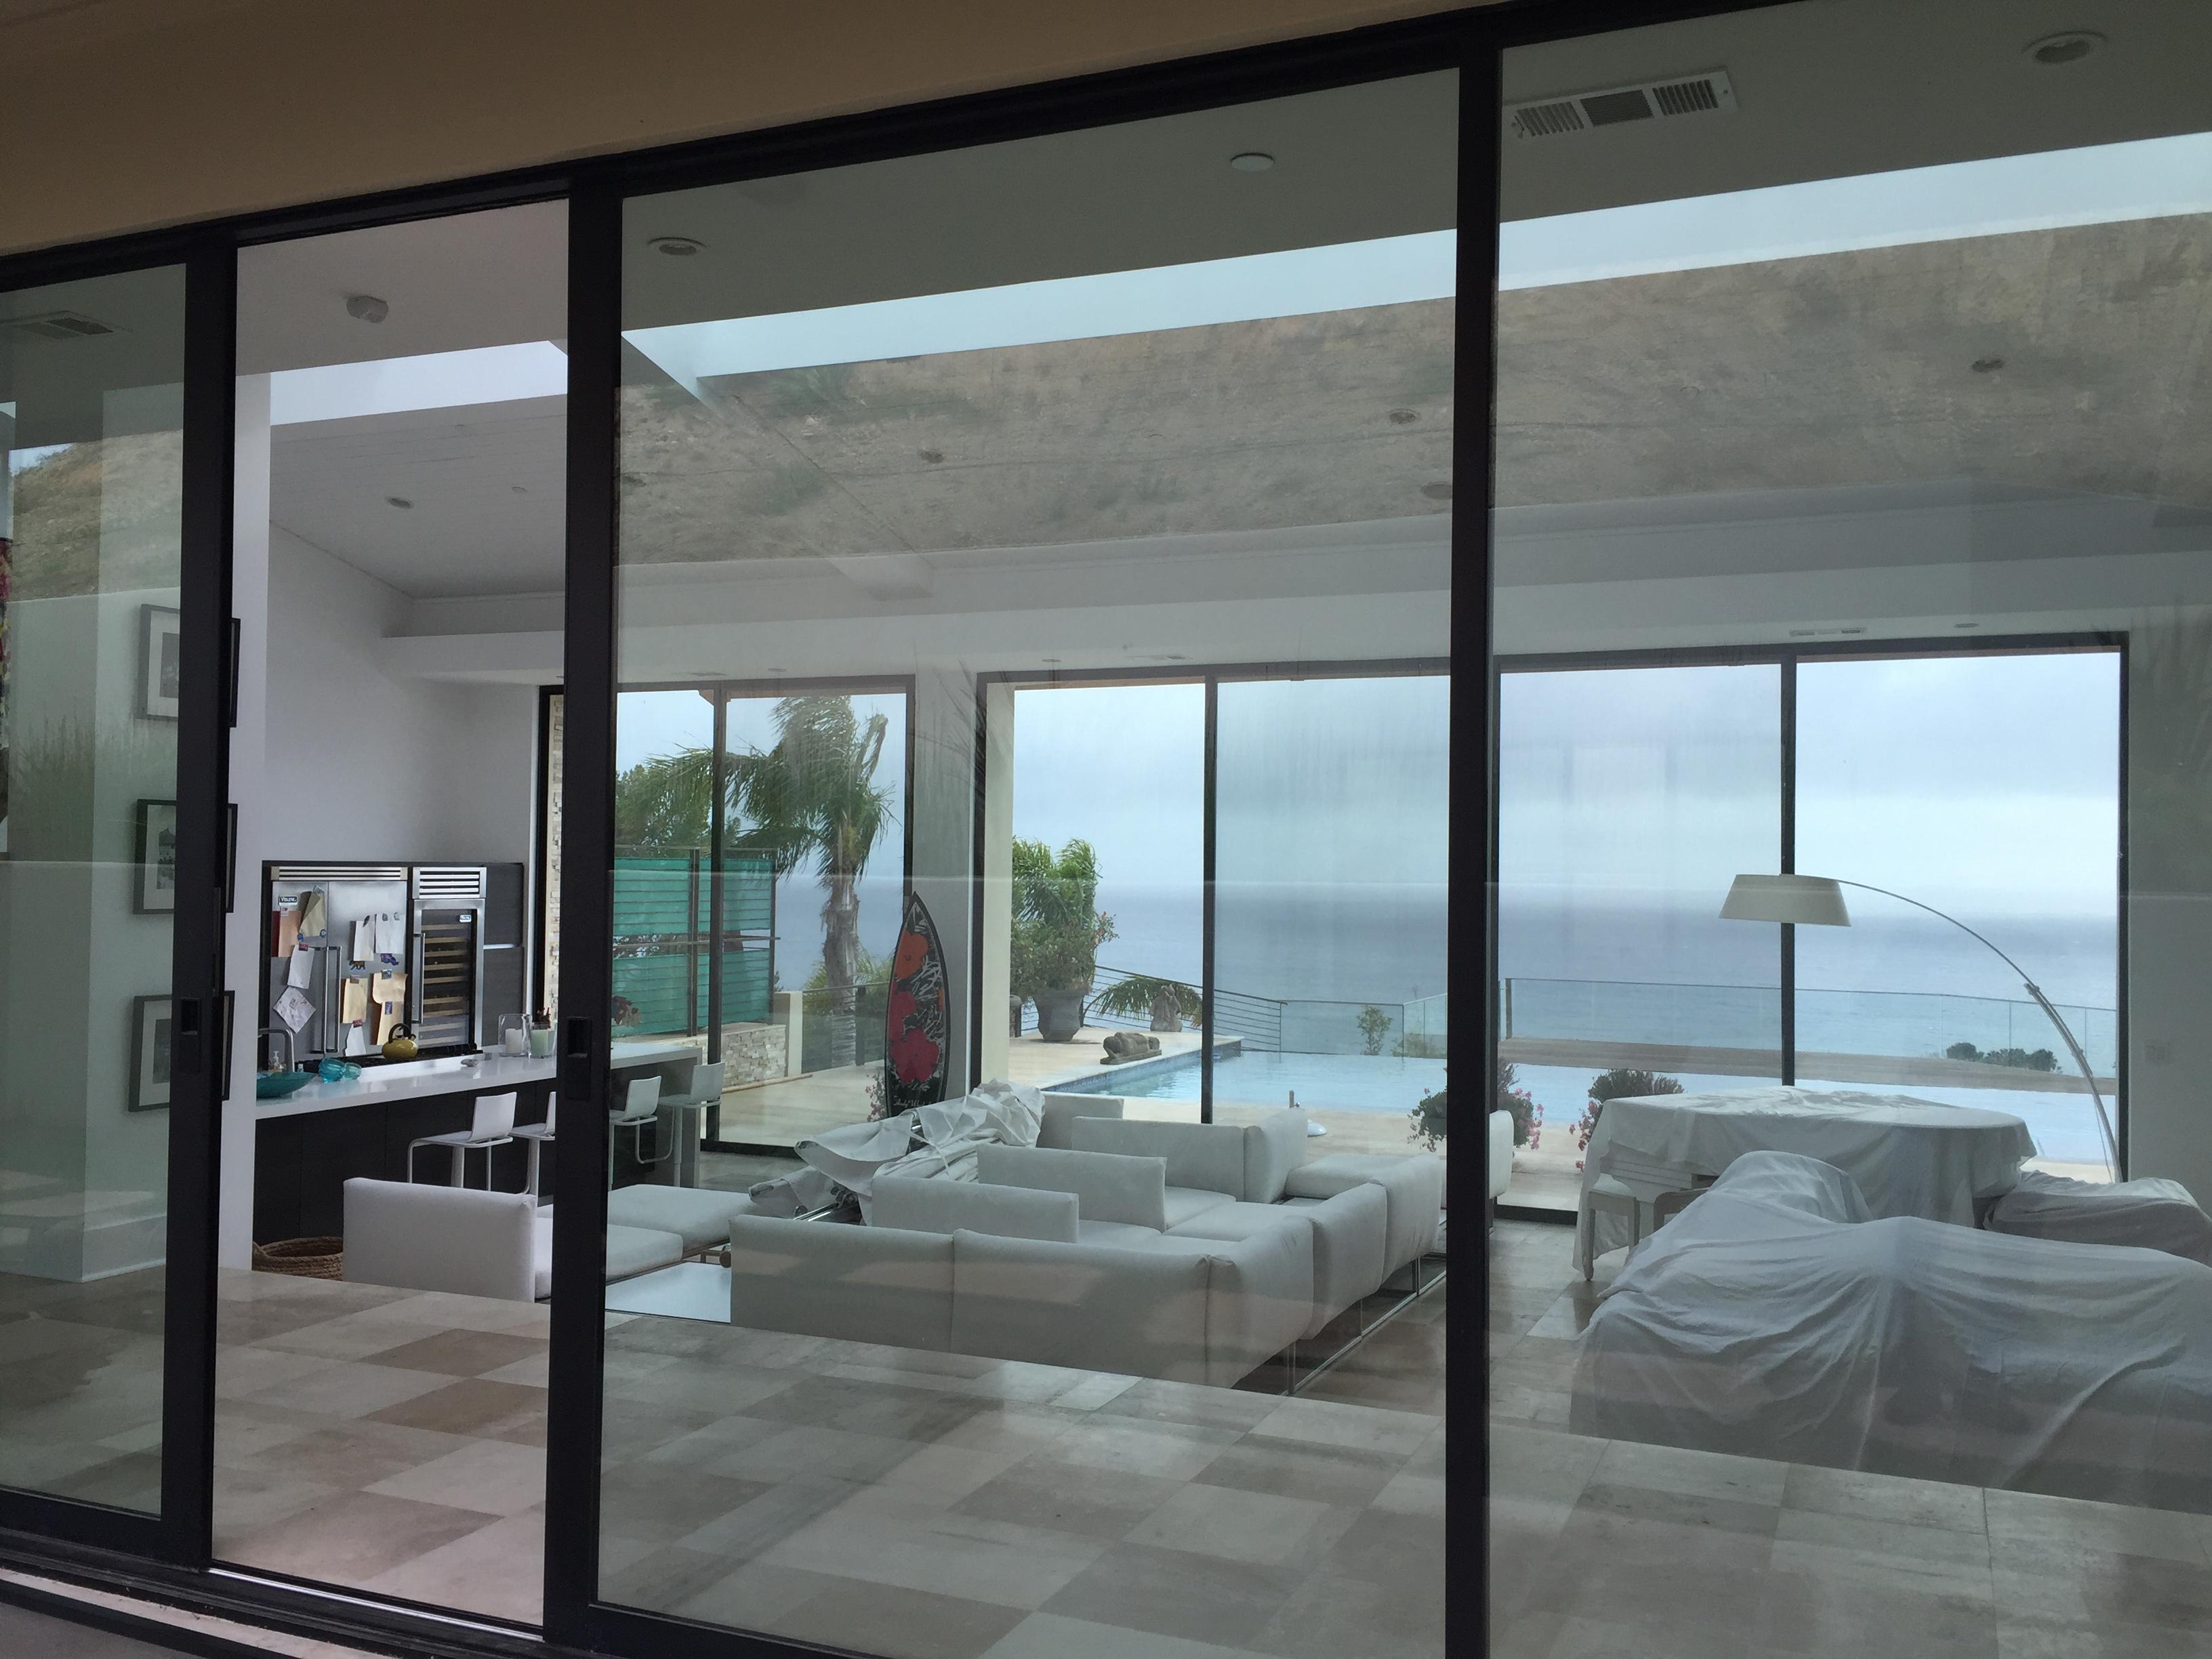 Patio Screen doors installed in Malibu home